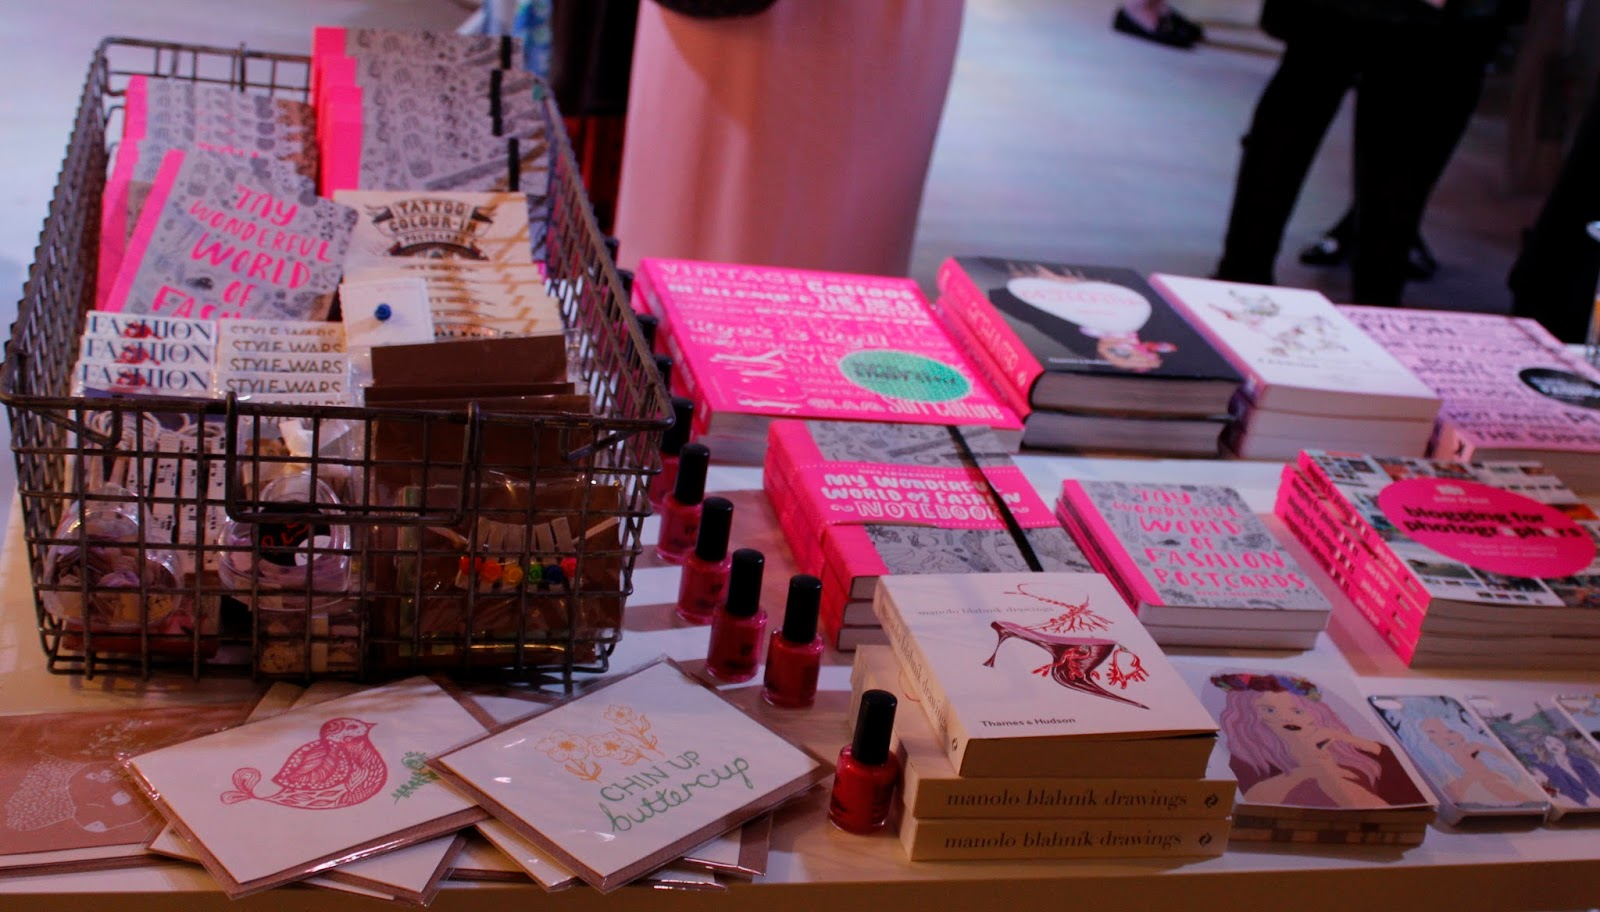 Re:So Southampton books & accessories